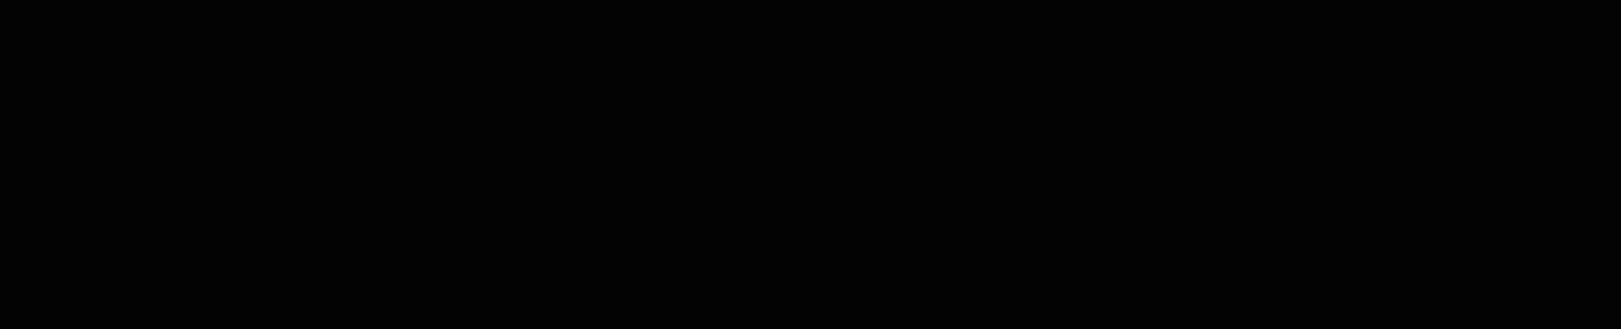 filmthehunt-logo-final-blk.png